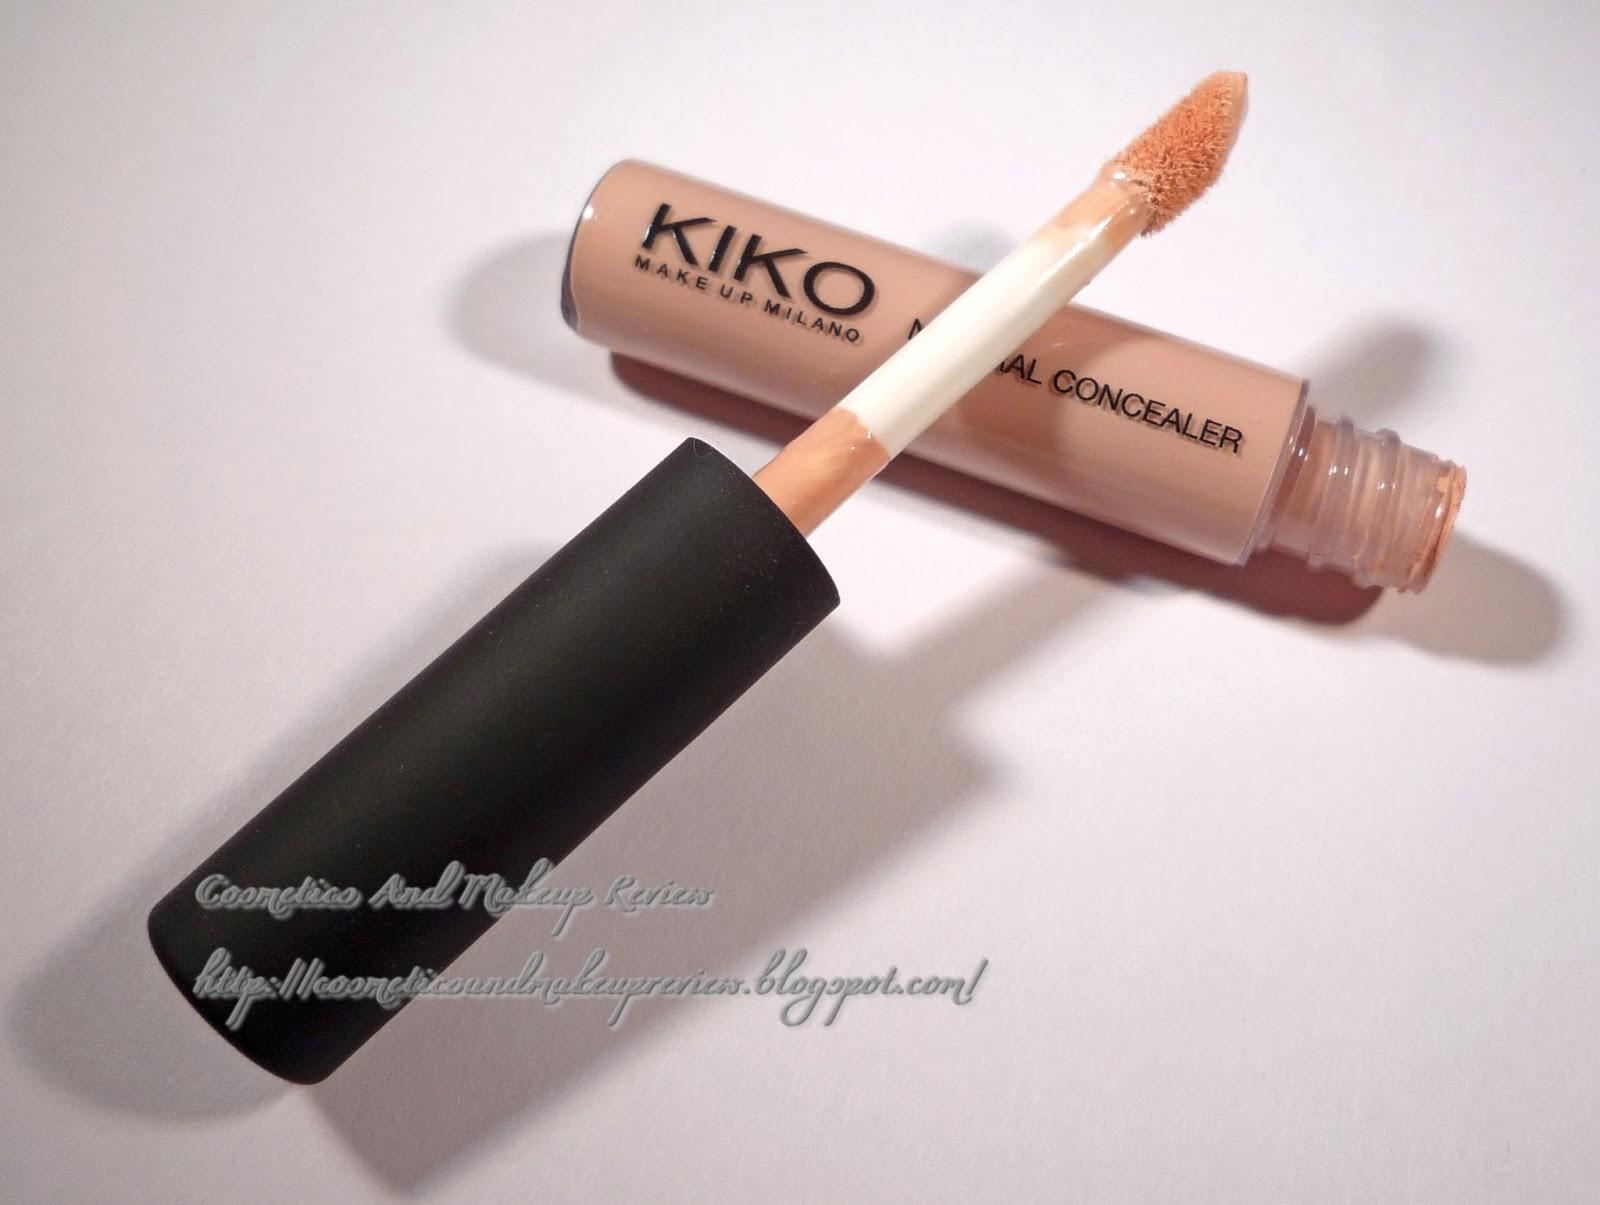 KIKO - Natural Concealer - 01 chiaro - tubetto aperto